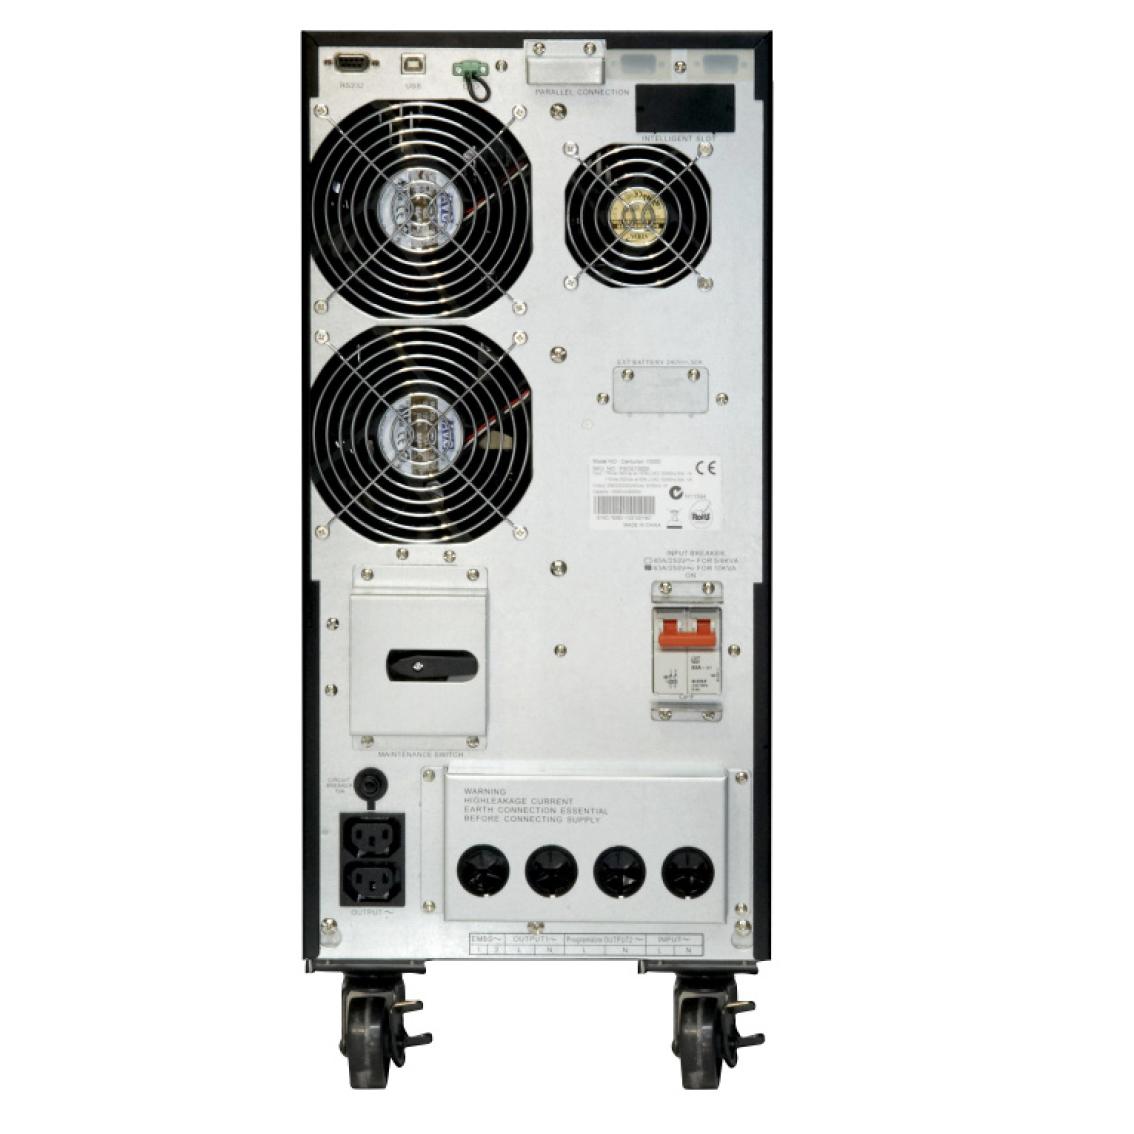 PSCE6000_Centurion6000_REAR